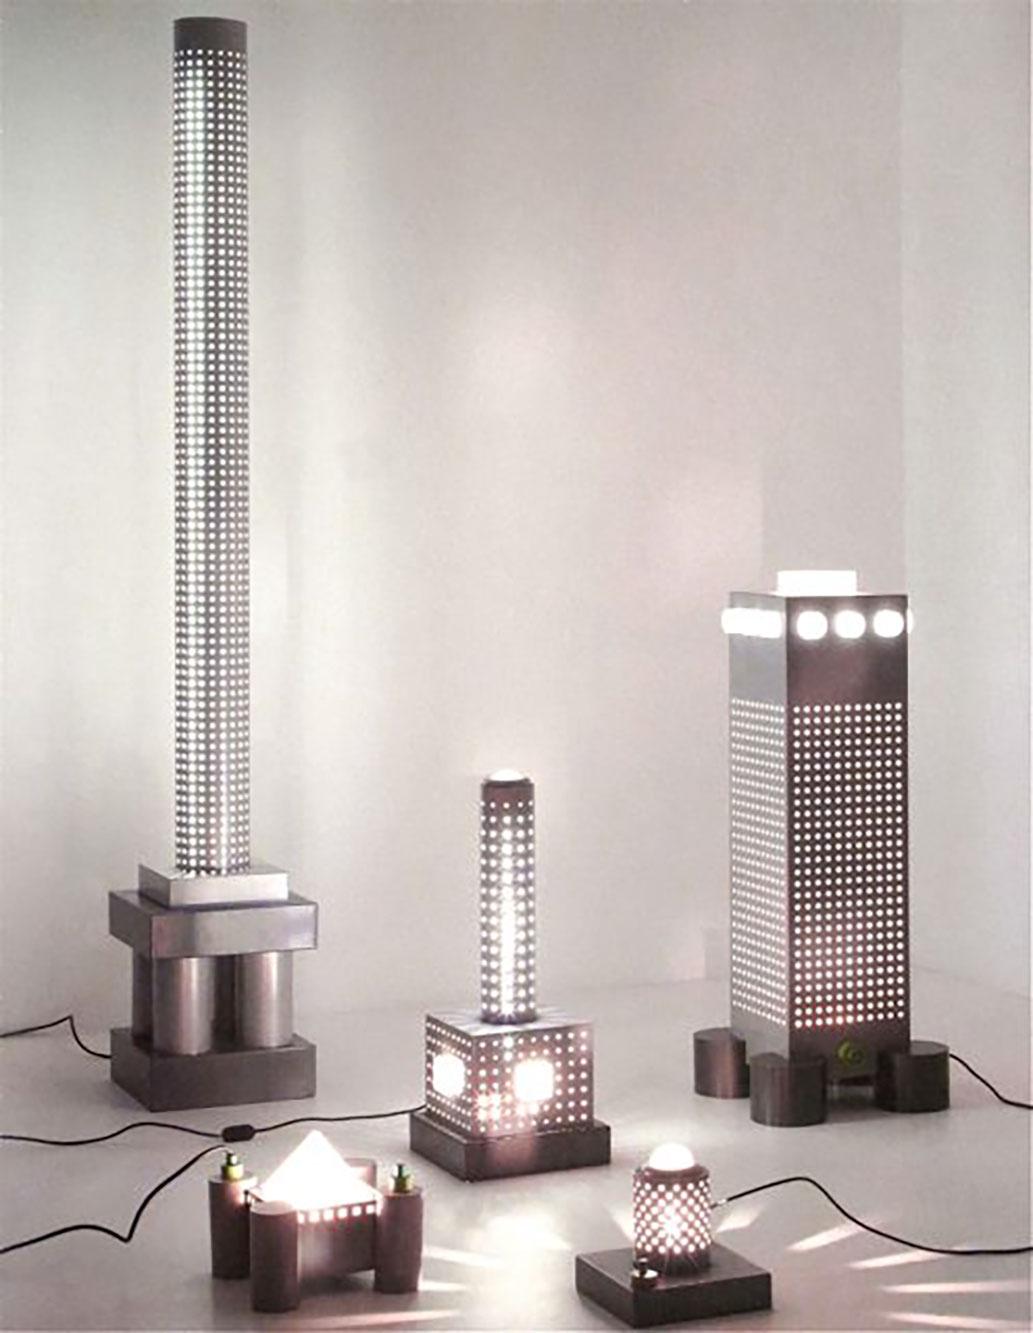 Matteo Thun & Andrea Lera wwf Tower Bieffeplast image 6